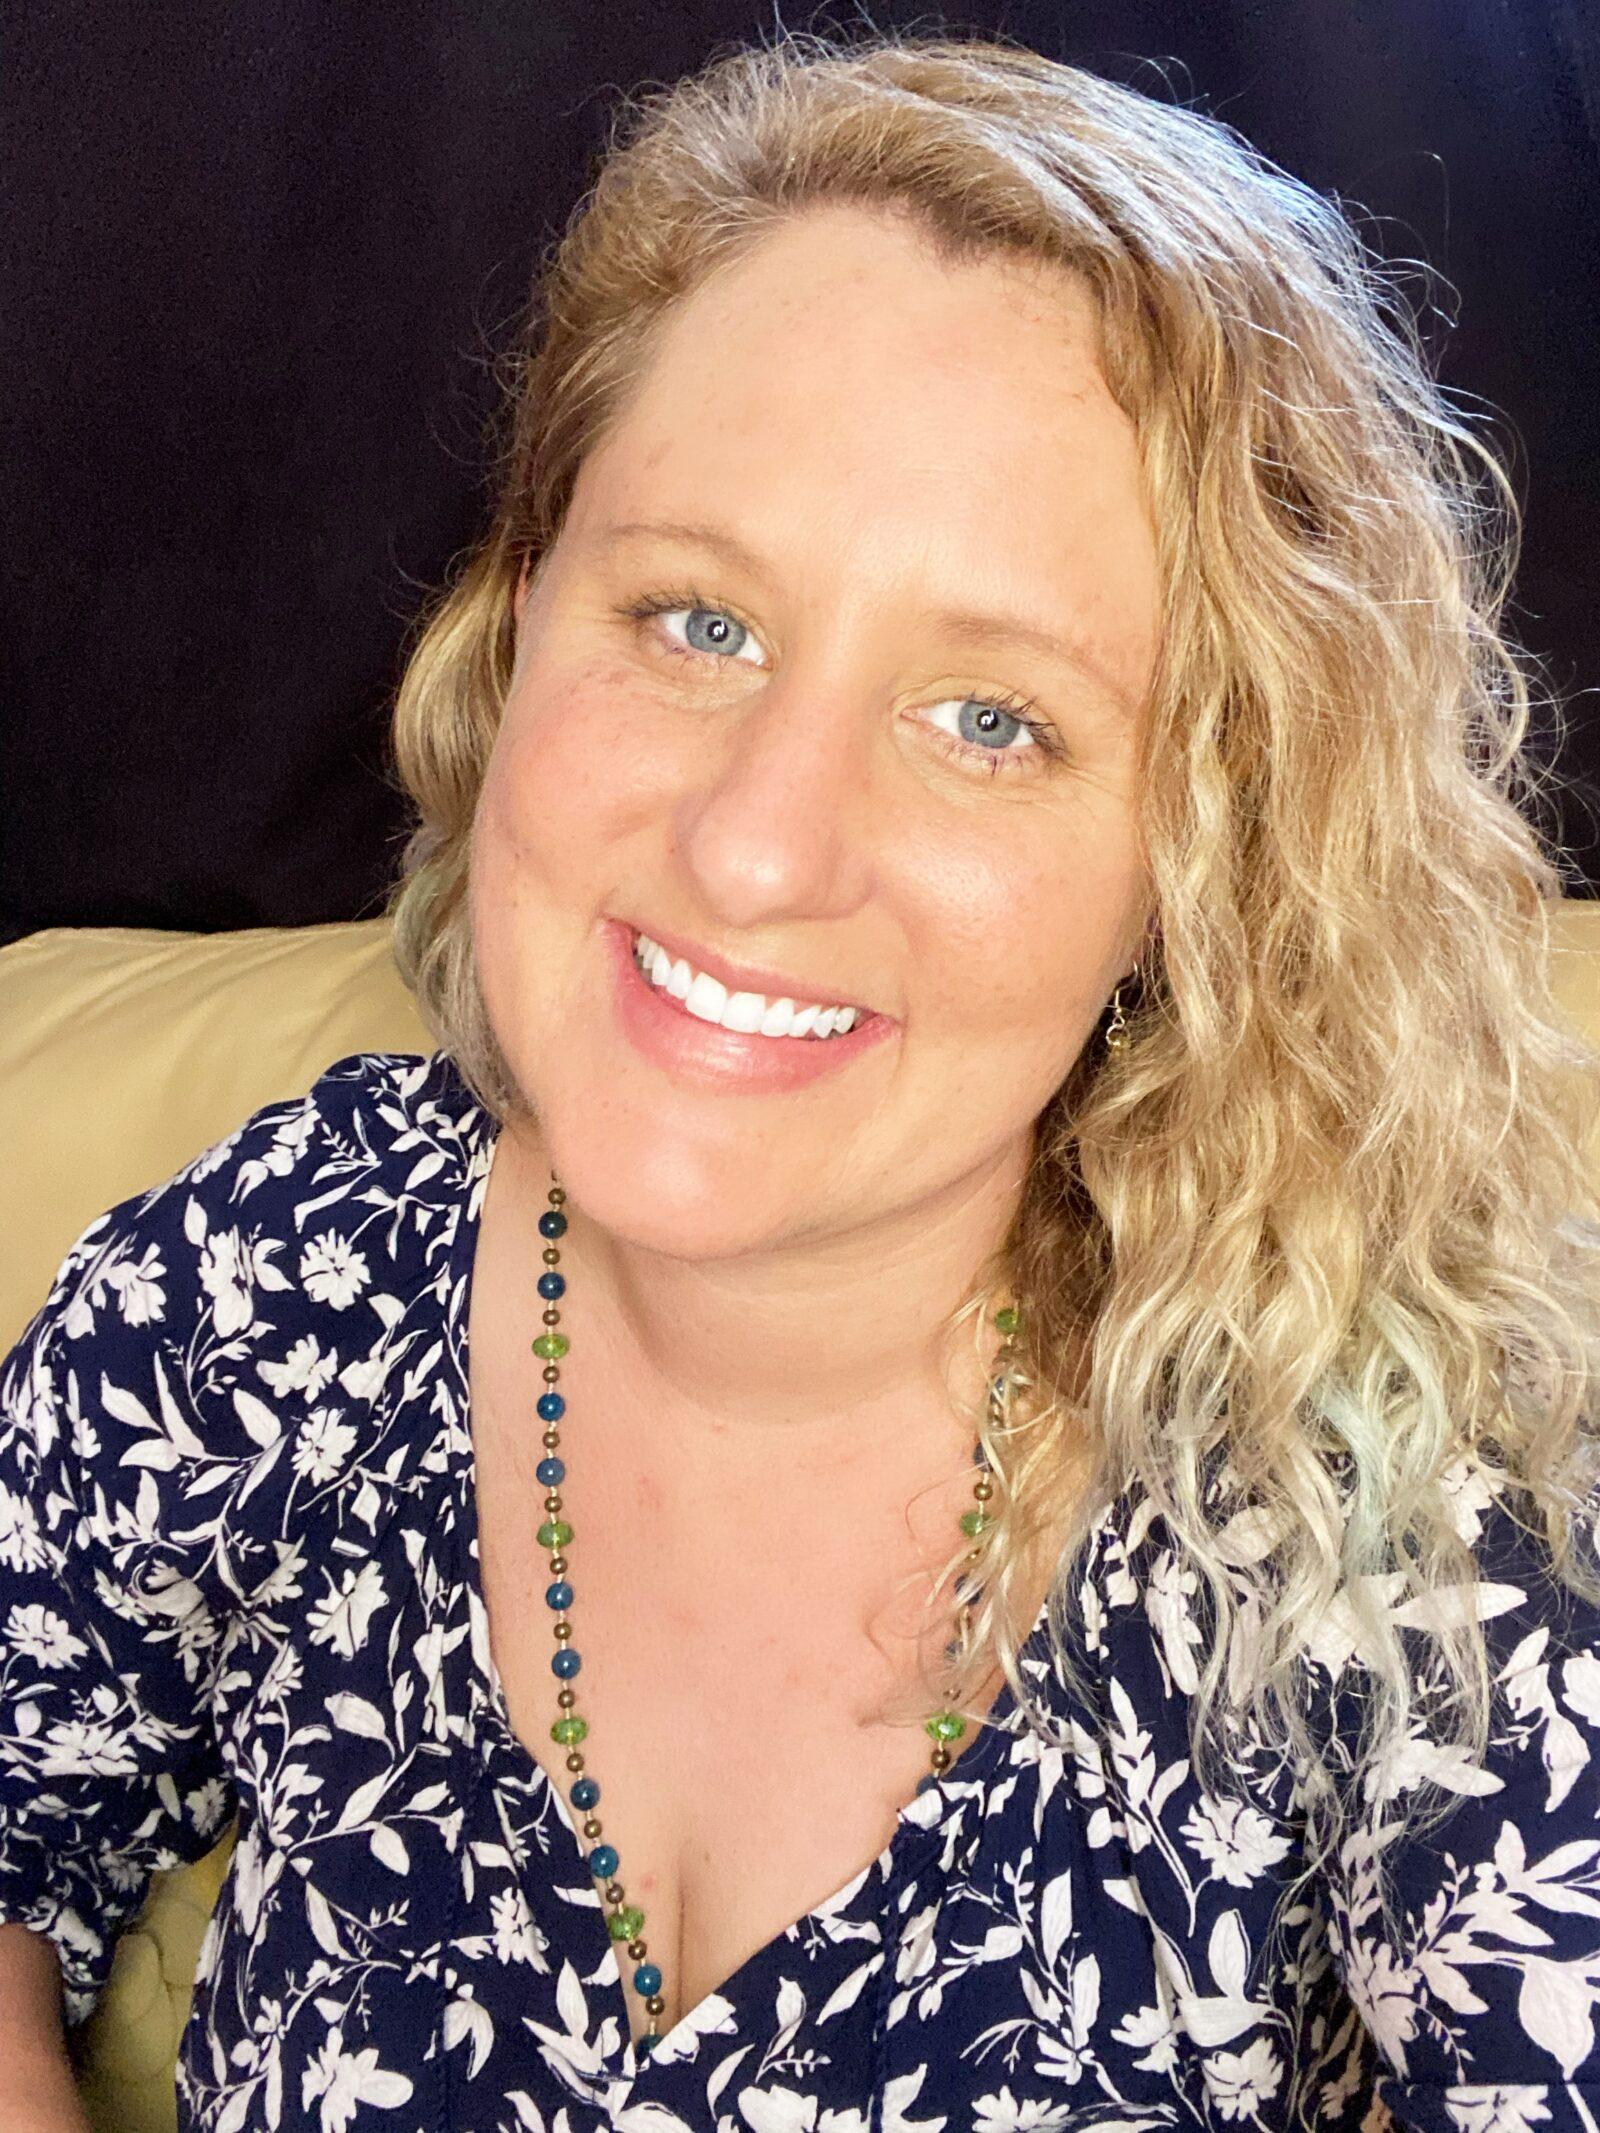 Allison Therapist Pic